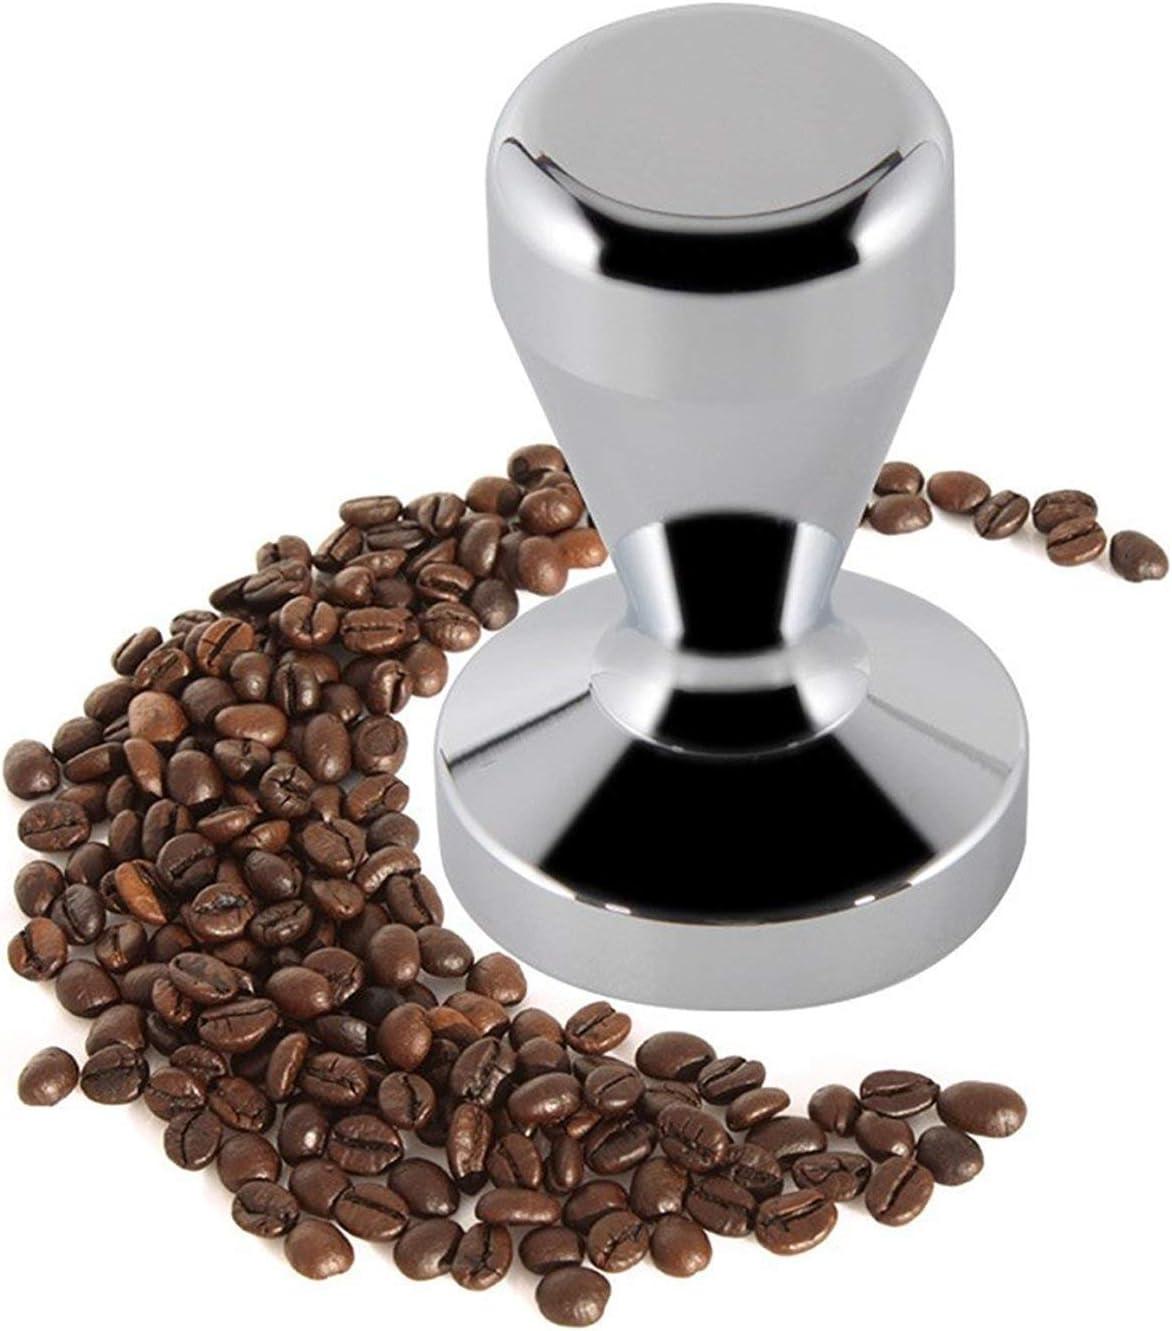 Drucksockel f/ür Edelstahl-Espresso-Manipulationspads DealsEuro Premium Coffee Tamper 58mm